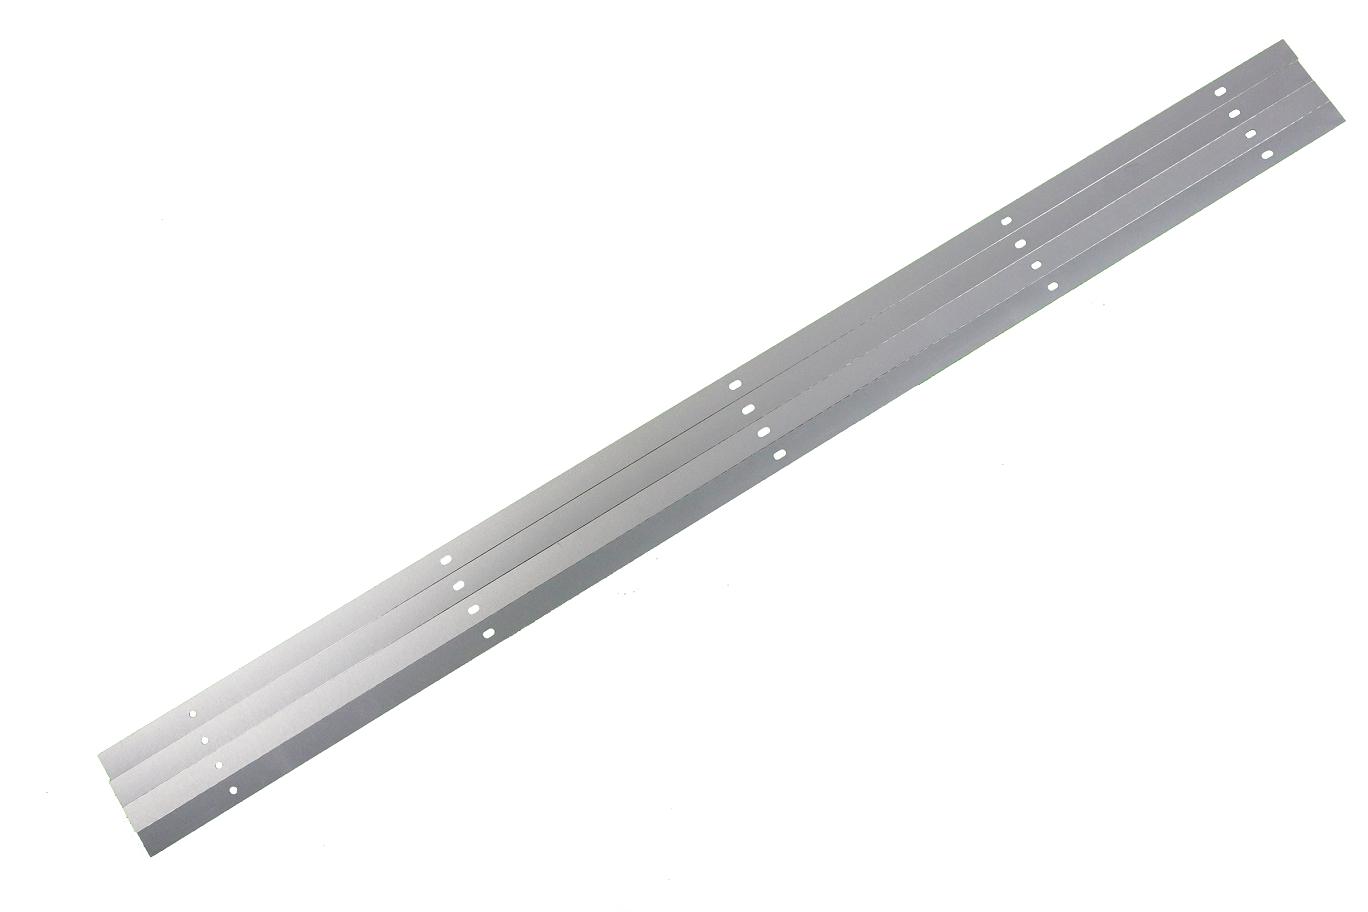 KIT BARRA DE LED PHILCO PH39N91DSGW PH39N91DSGWA